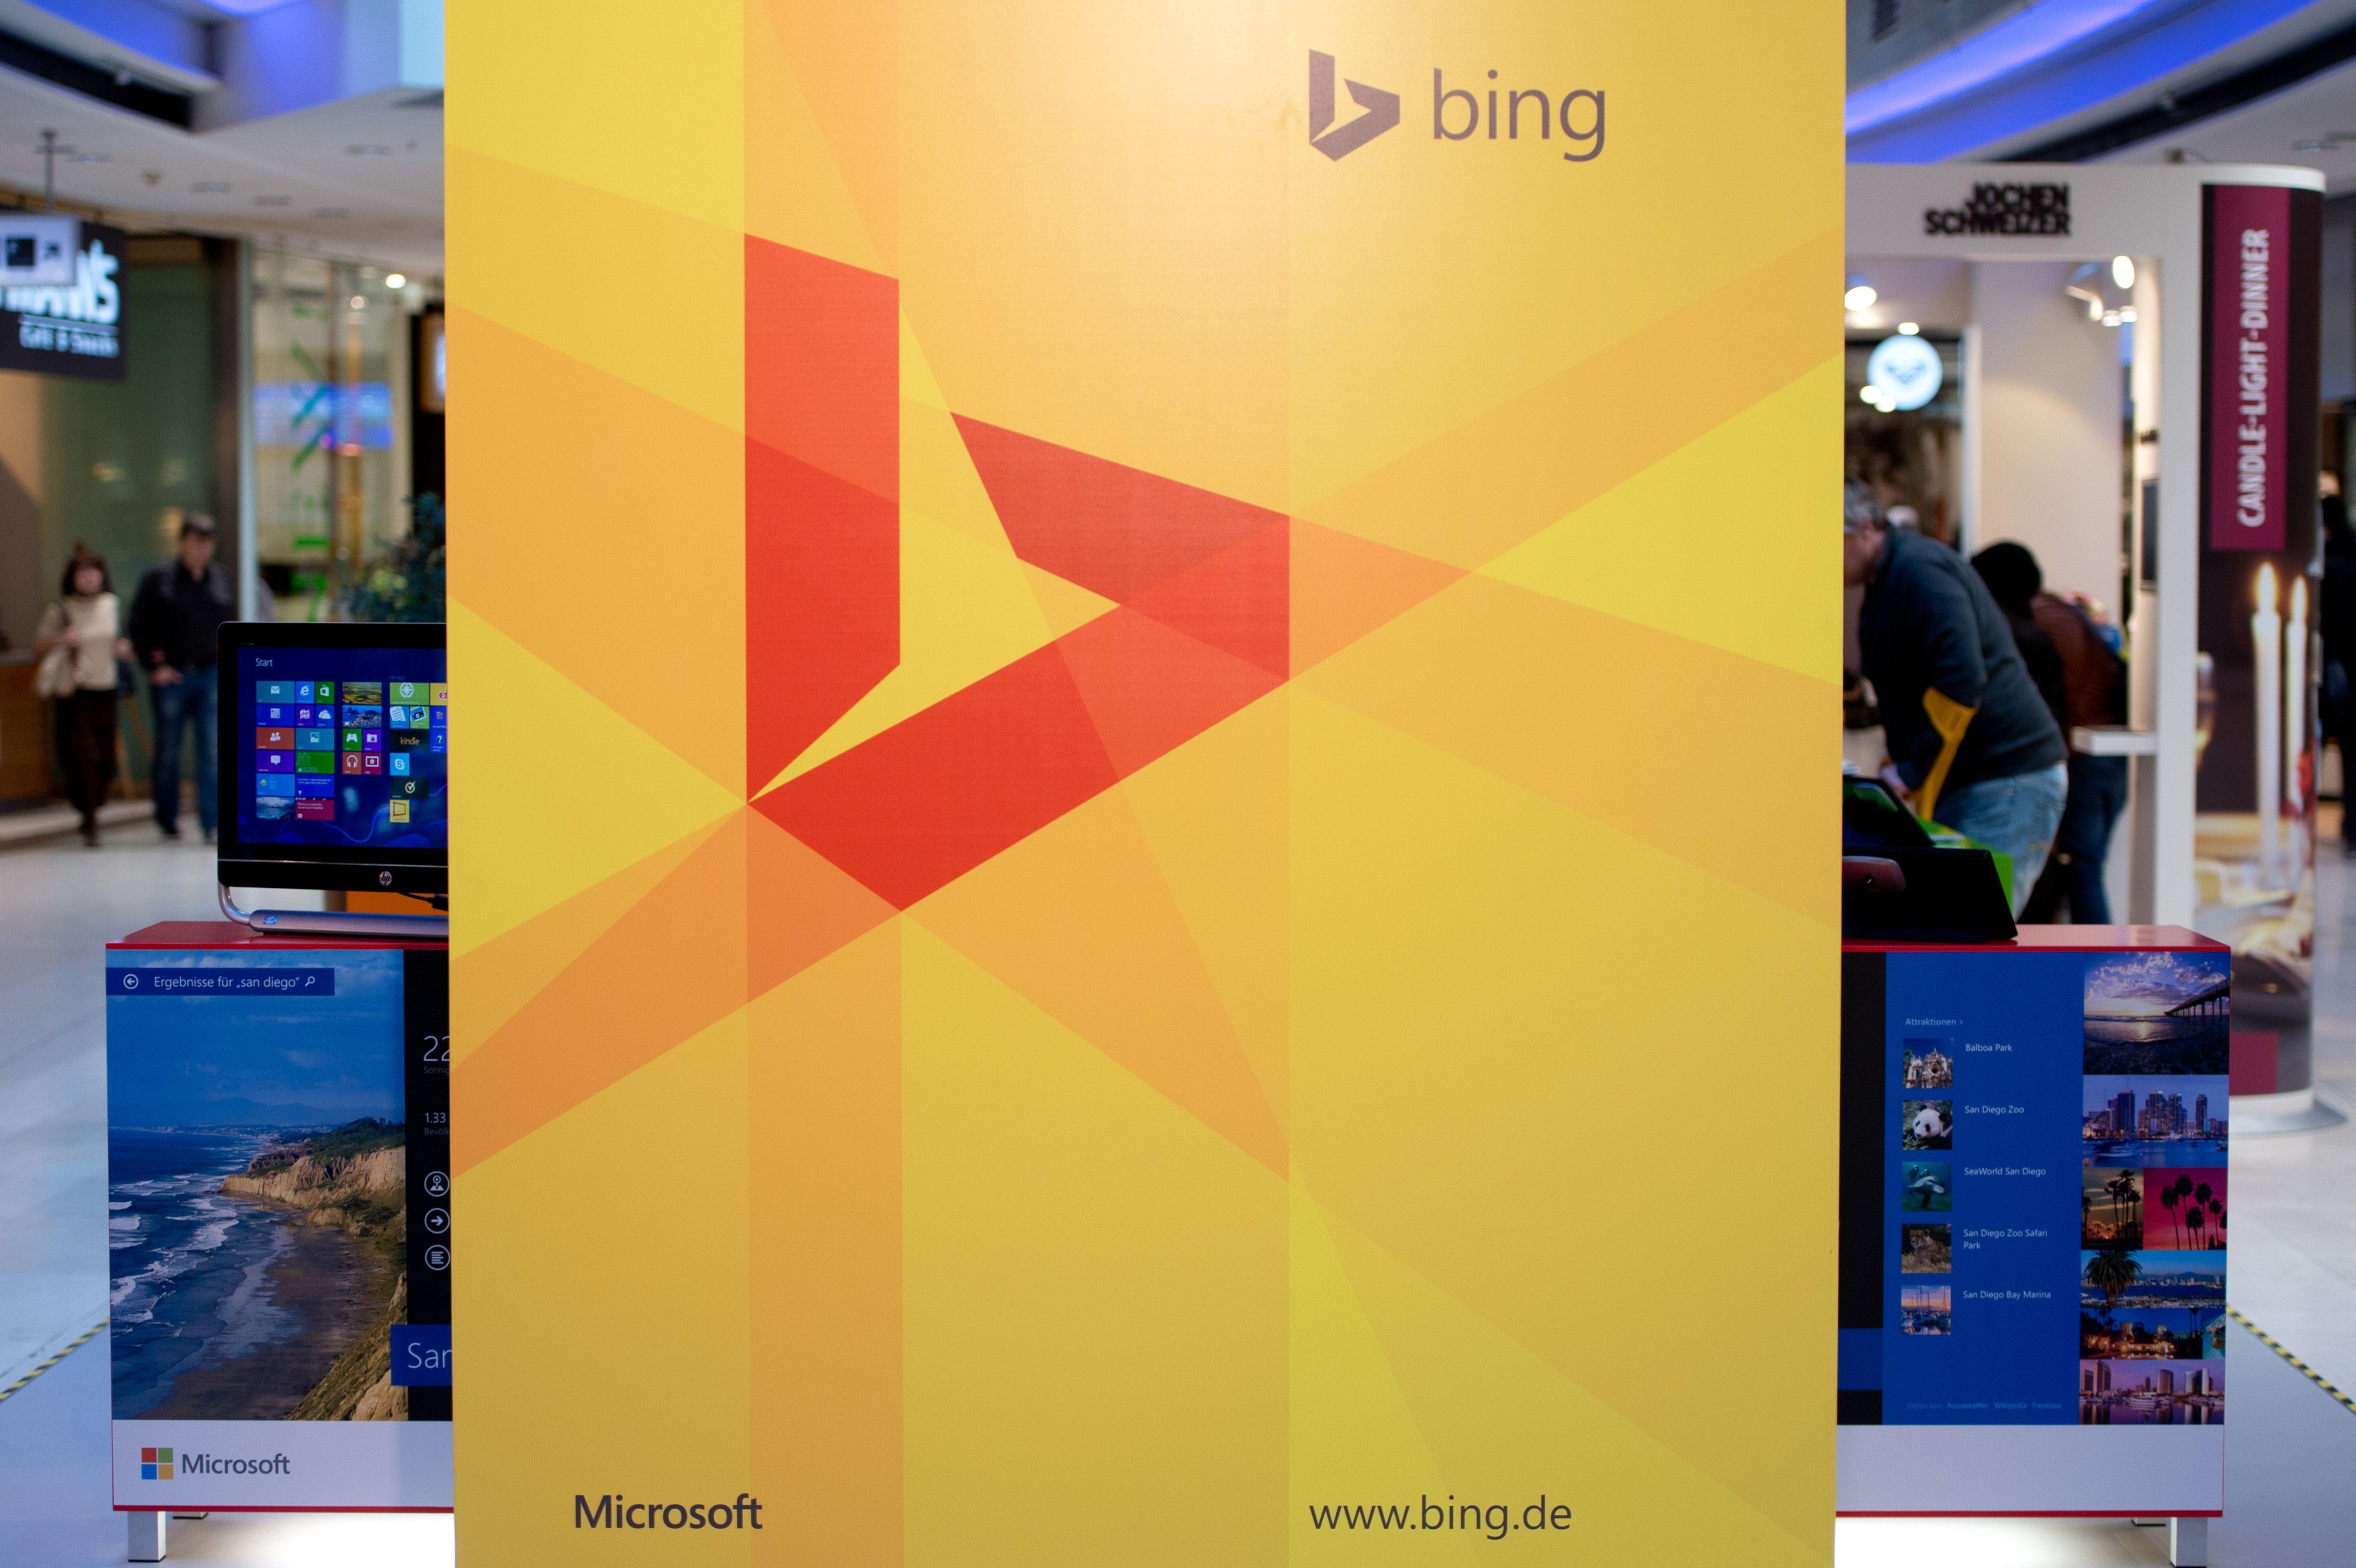 Microsoft's Bing logo is displayed on July 5, 2014 in Stuttgart, Germany.